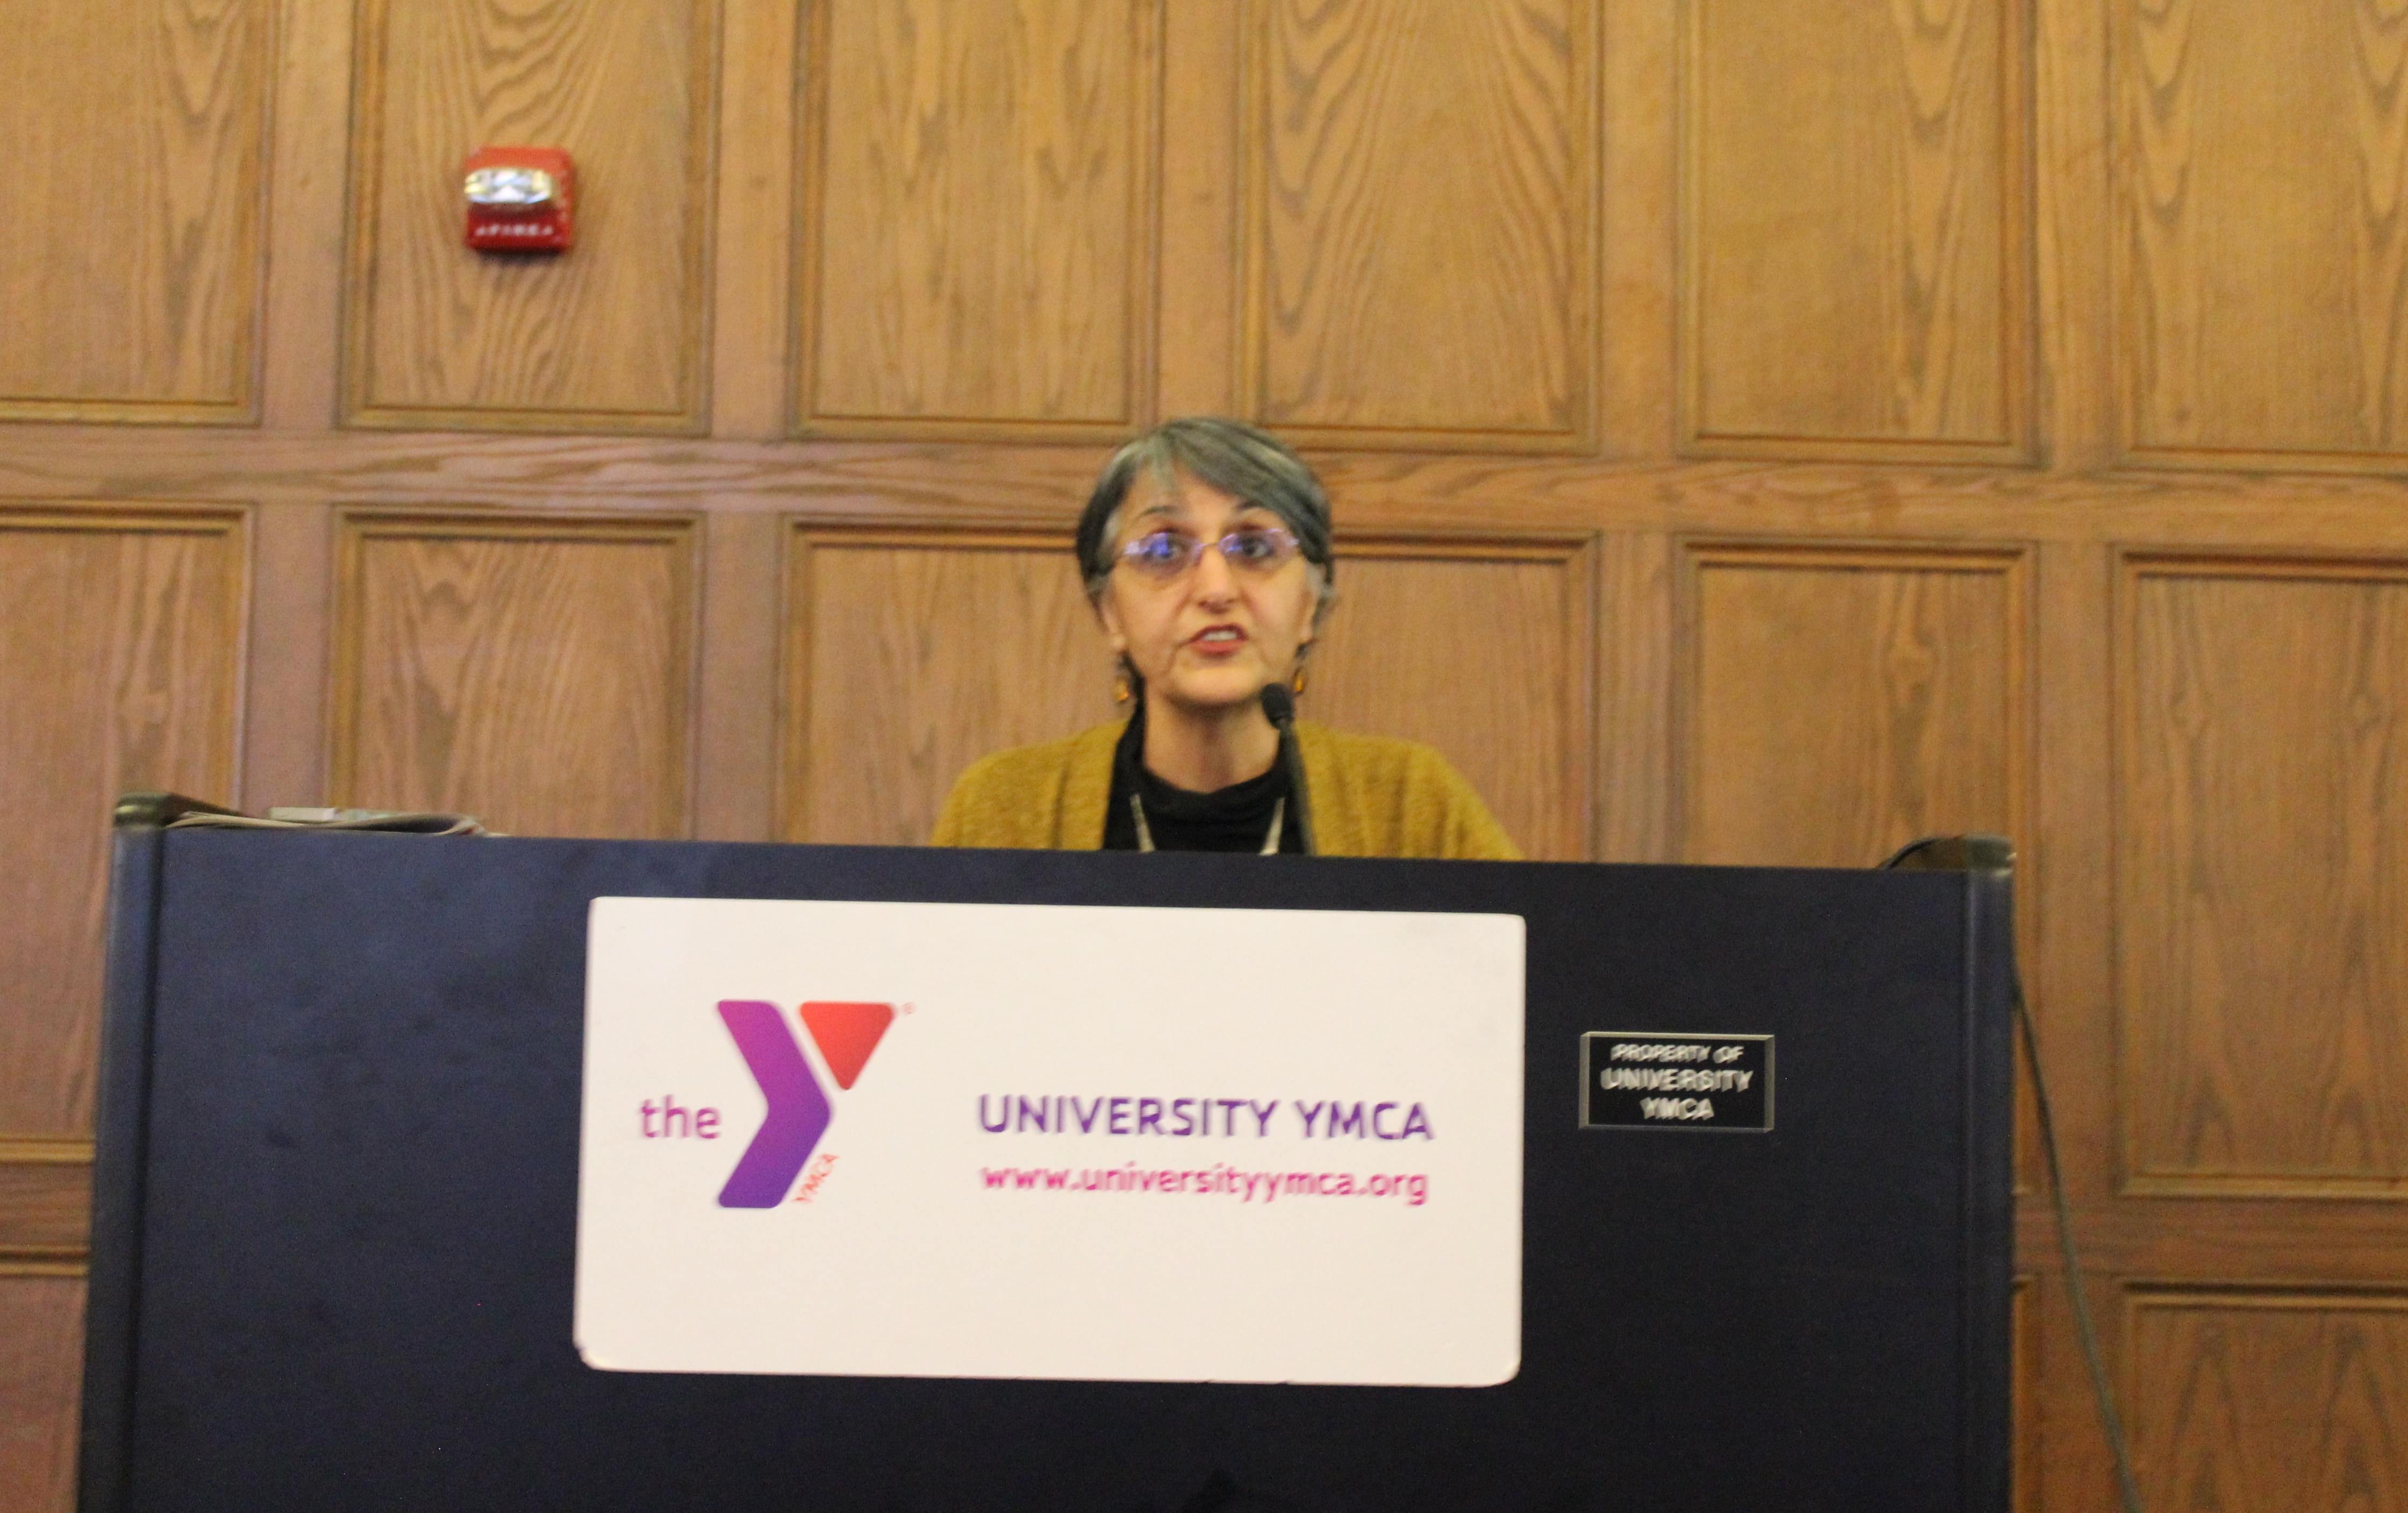 U of I Urban and Regional Planning Professor Faranak Miraftab discusses her research of Beardstown at the University YMCA Friday.